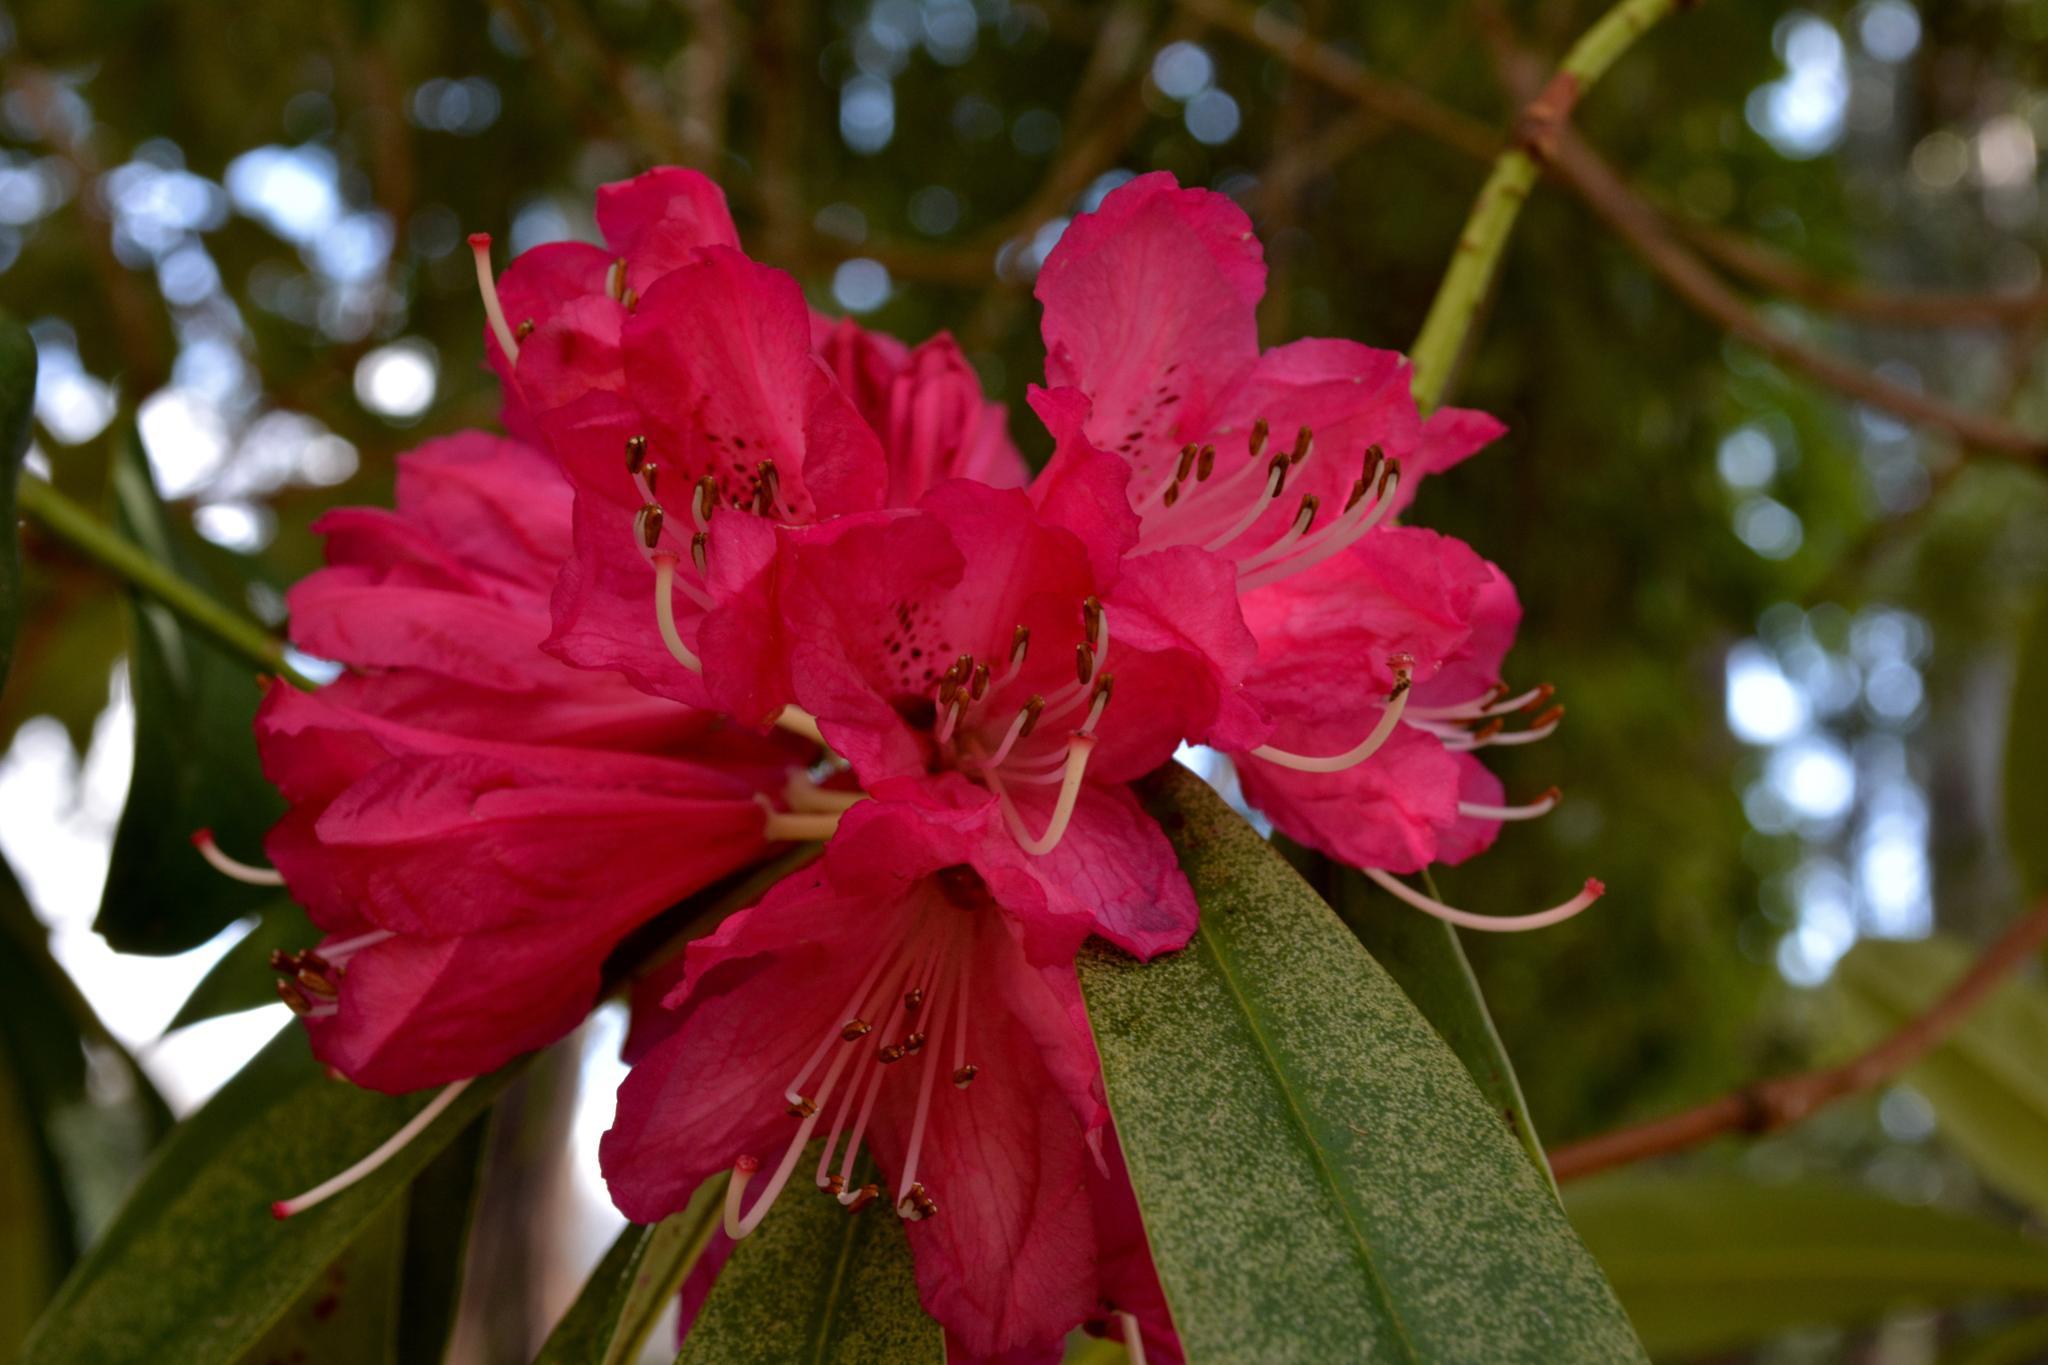 Red Flower by Daniel A Robb